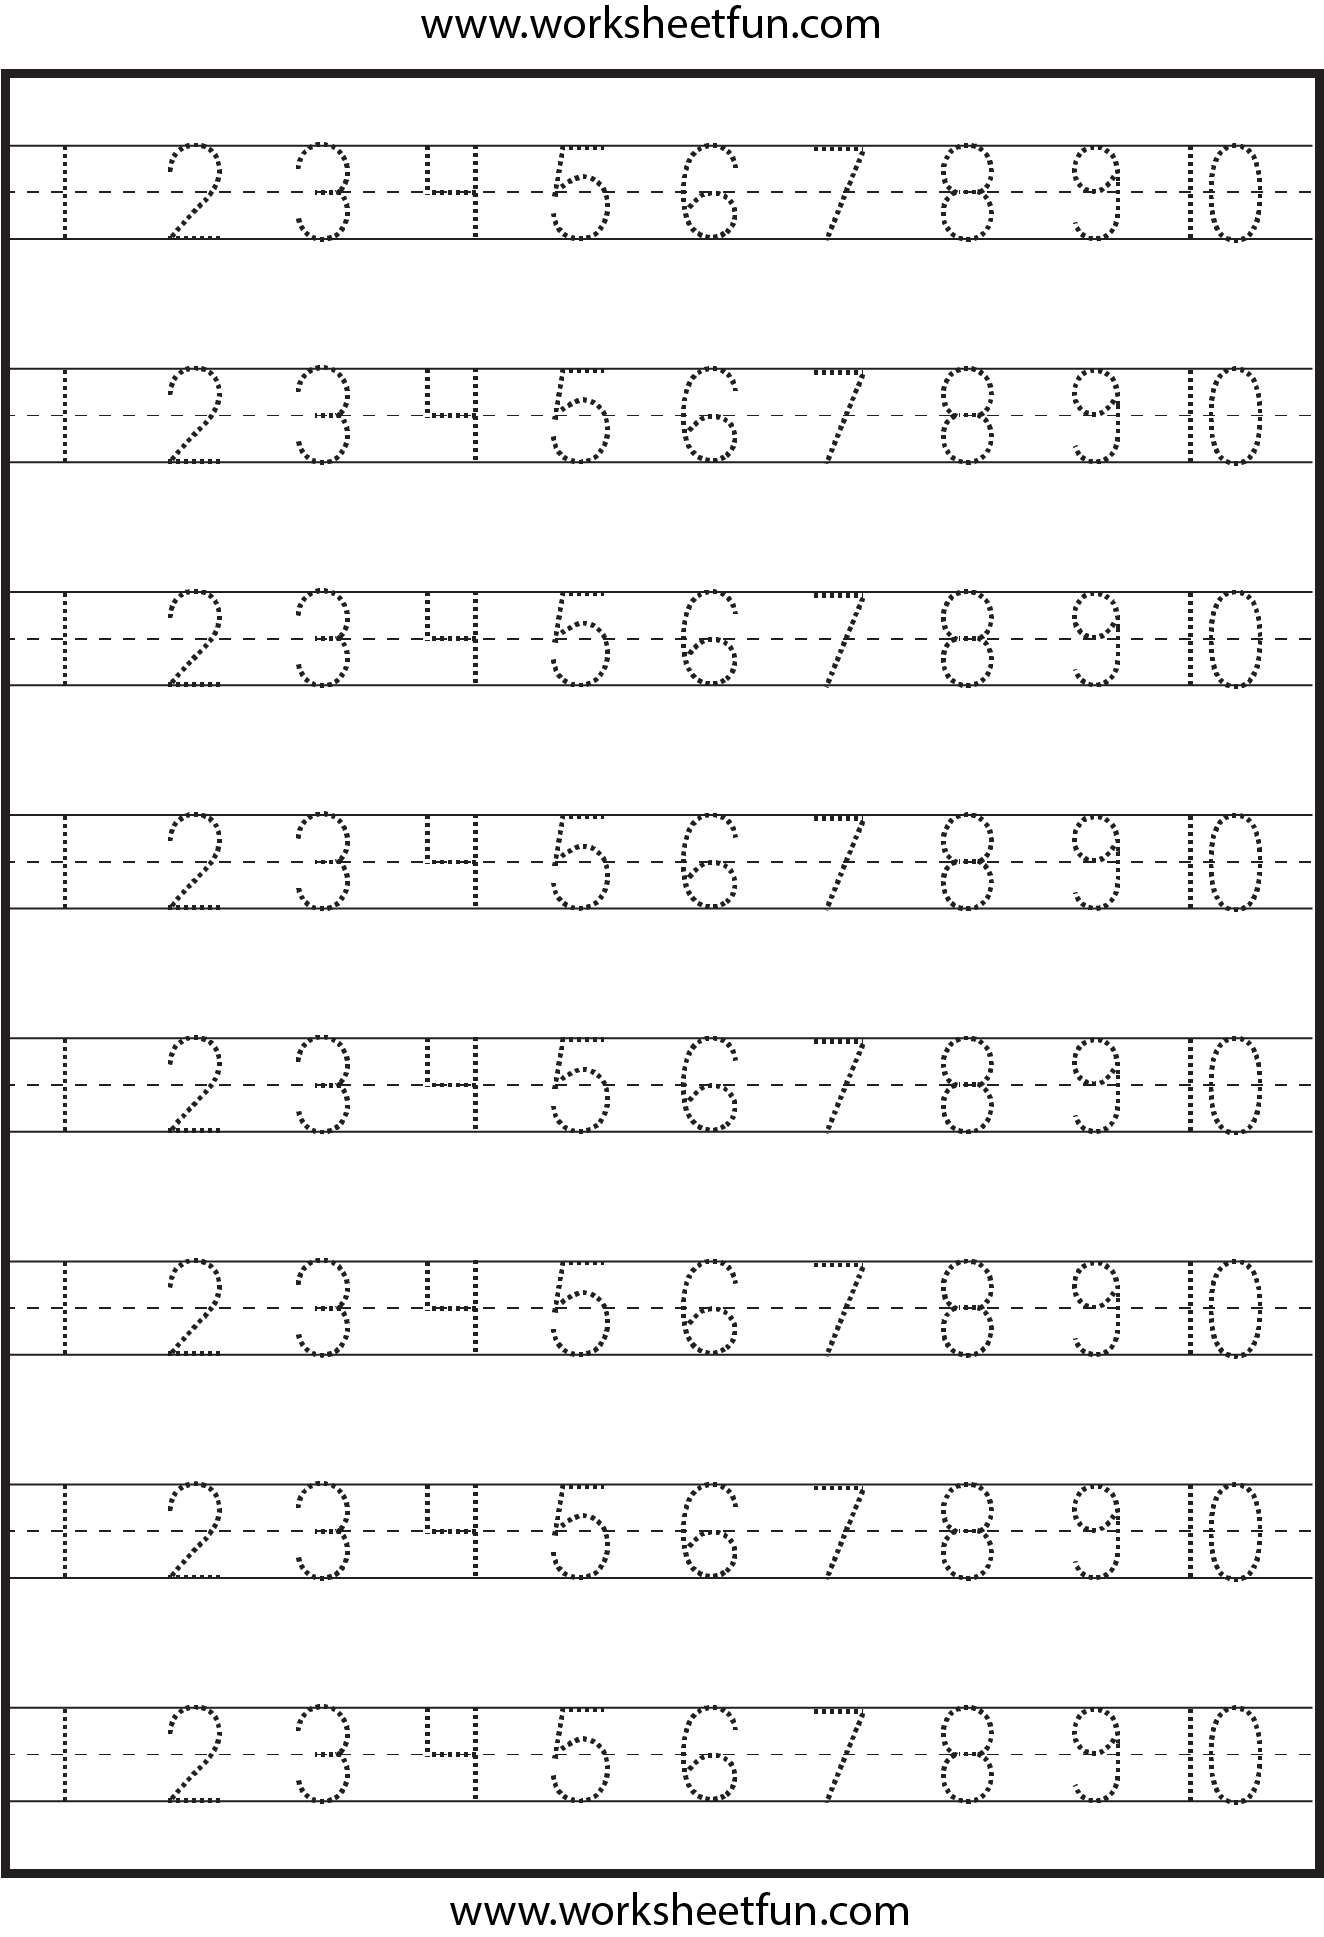 Number Tracing 1-10 - Worksheet | Okul Öncesi Çalışma